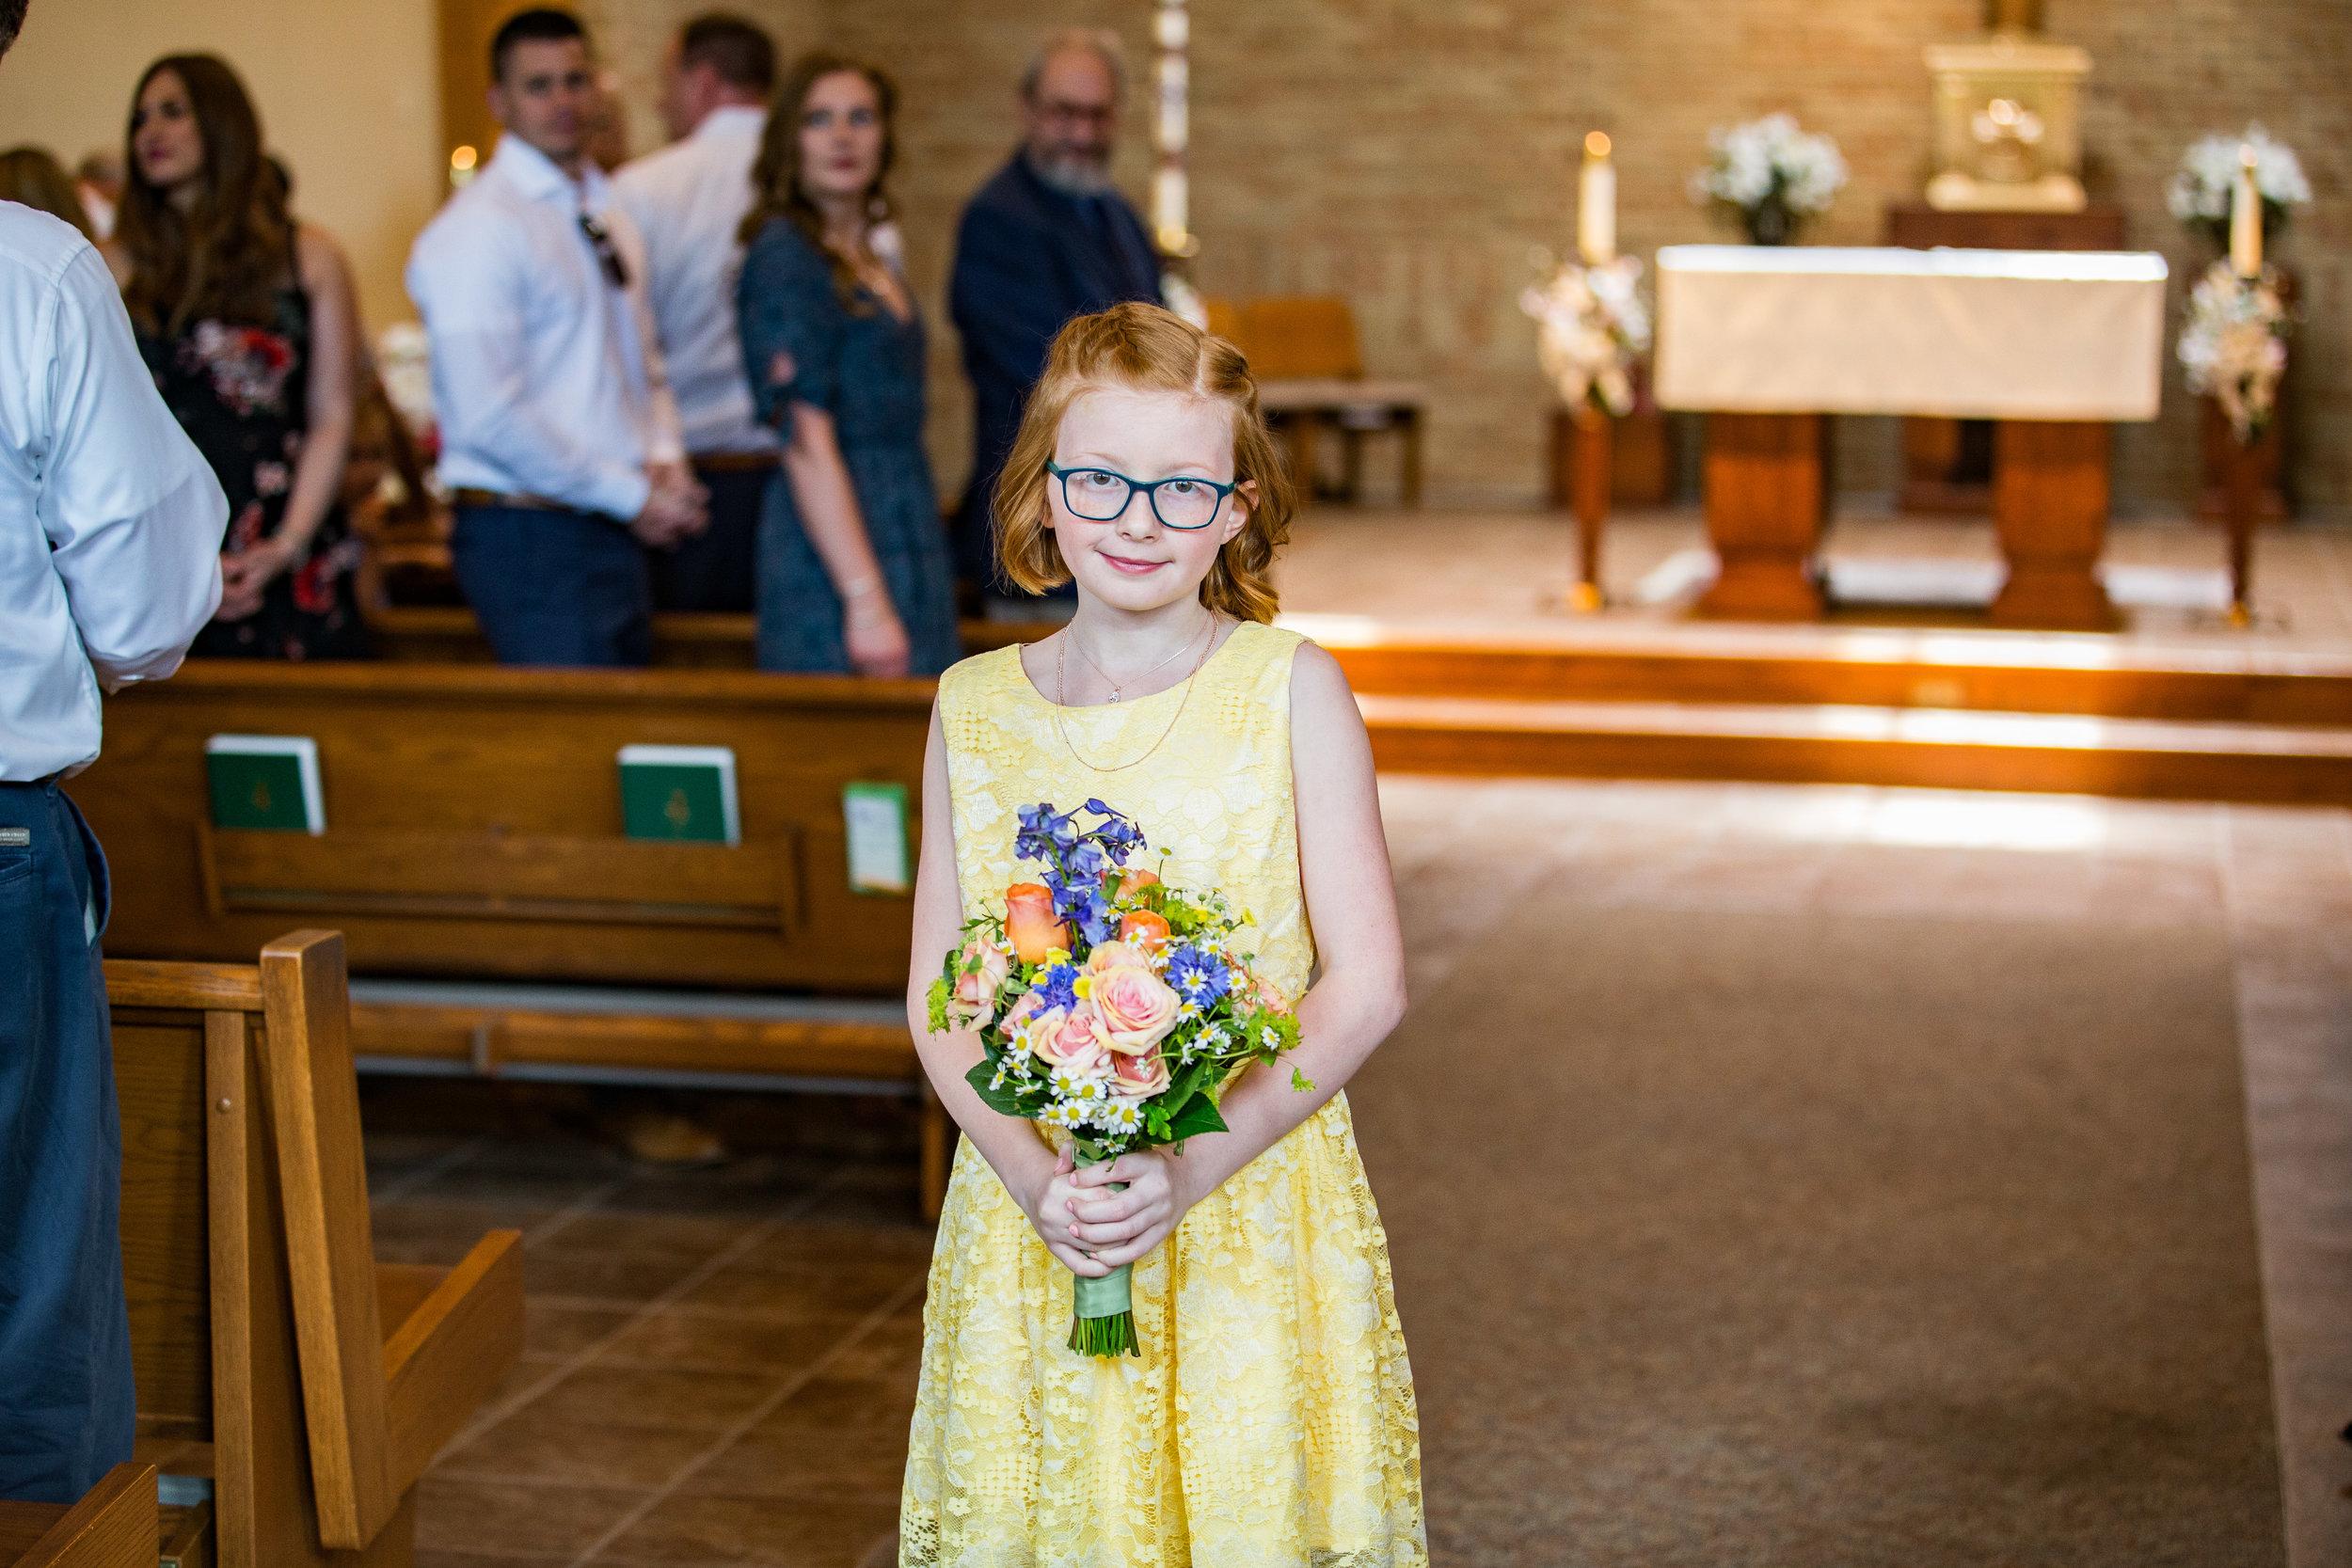 Natalie and Dallas Mooney Wedding 6-8-19_Tania Watt Photography-157.jpg